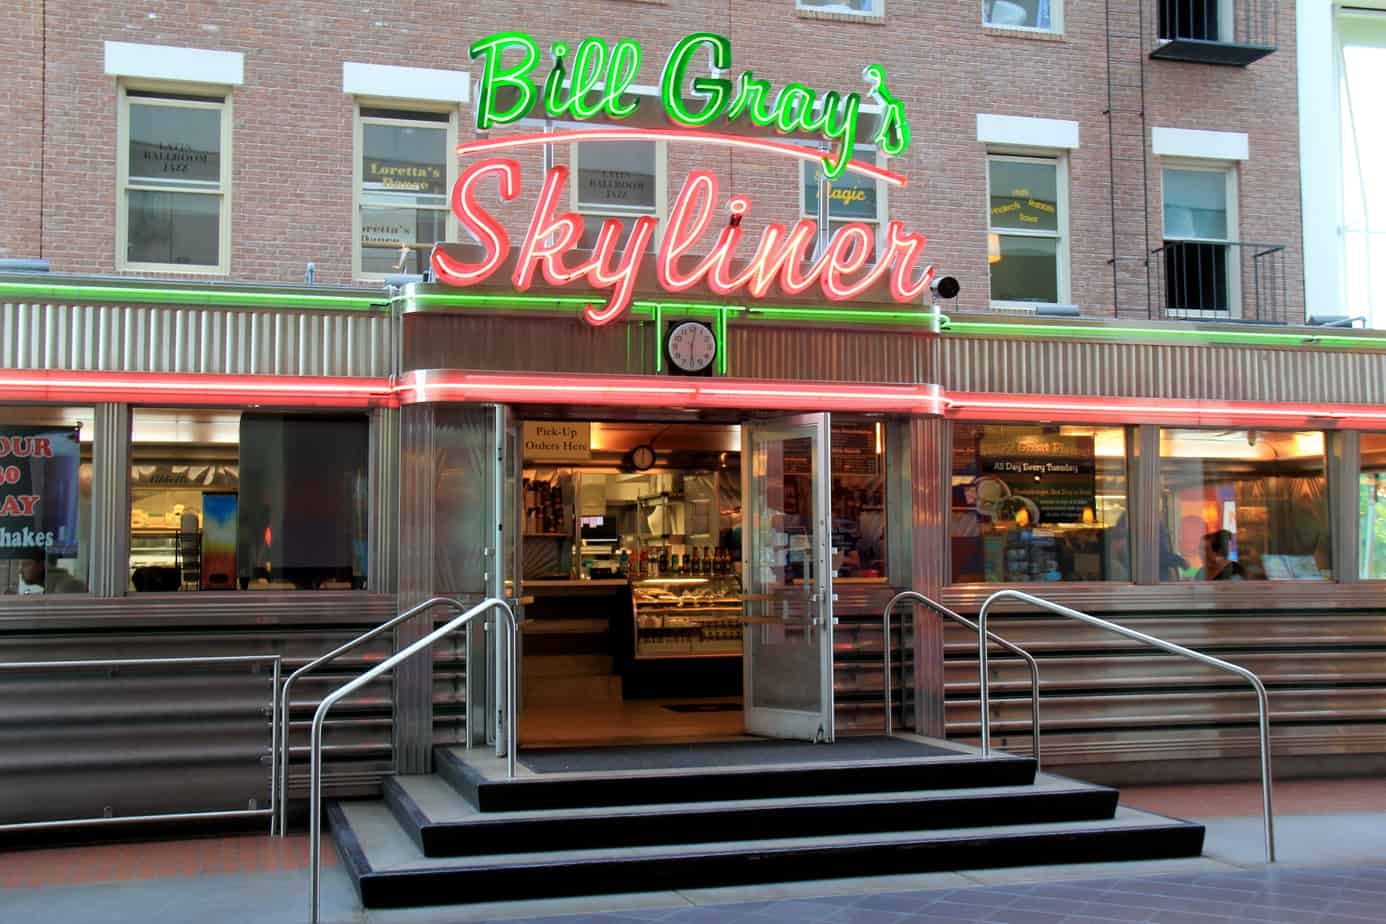 Bill Gray's Skyline Diner Rochester